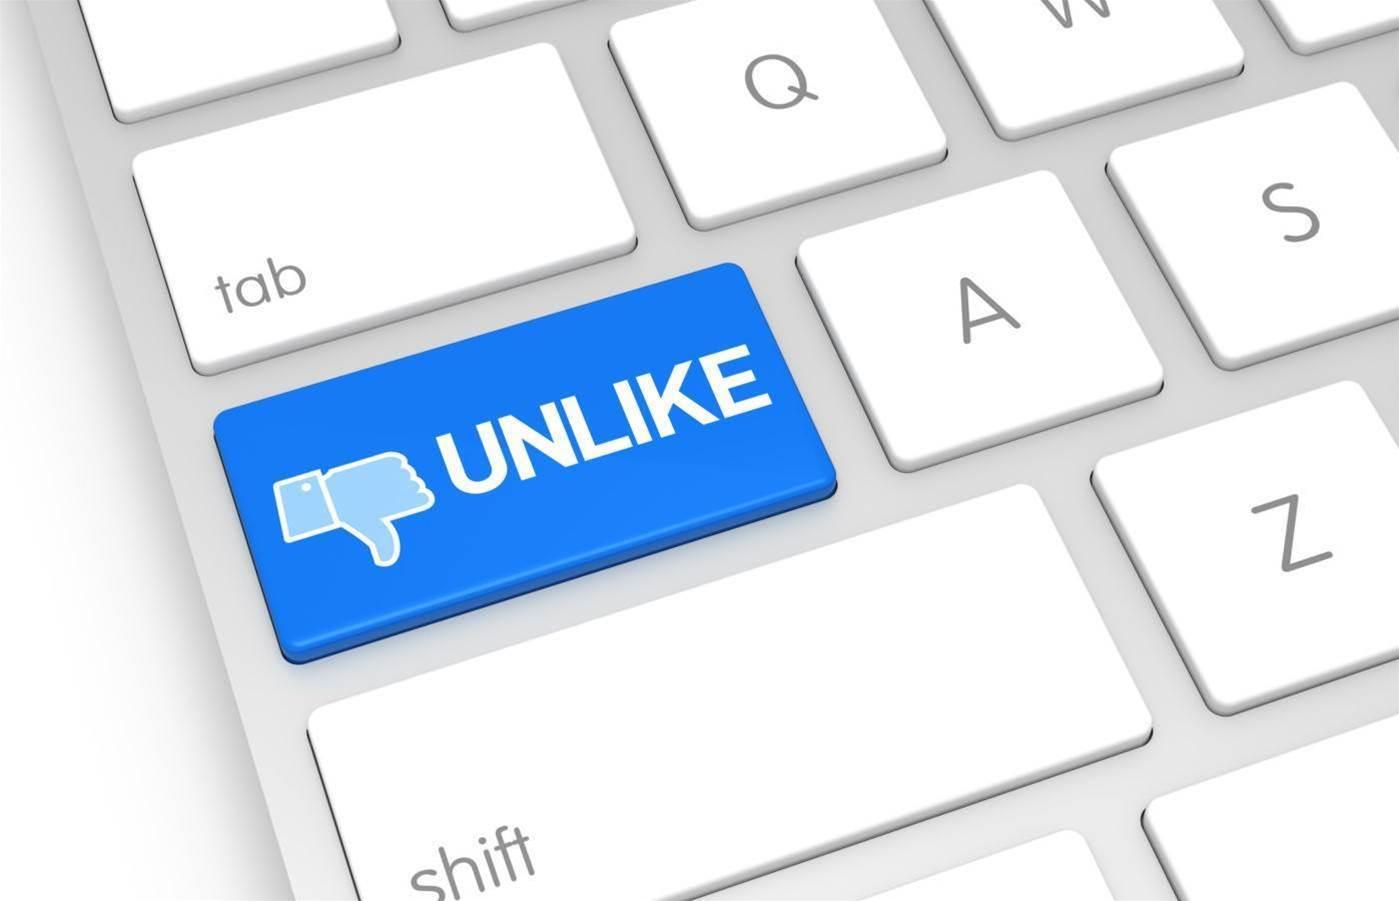 Facebook fixes password flaw, will still warn millions